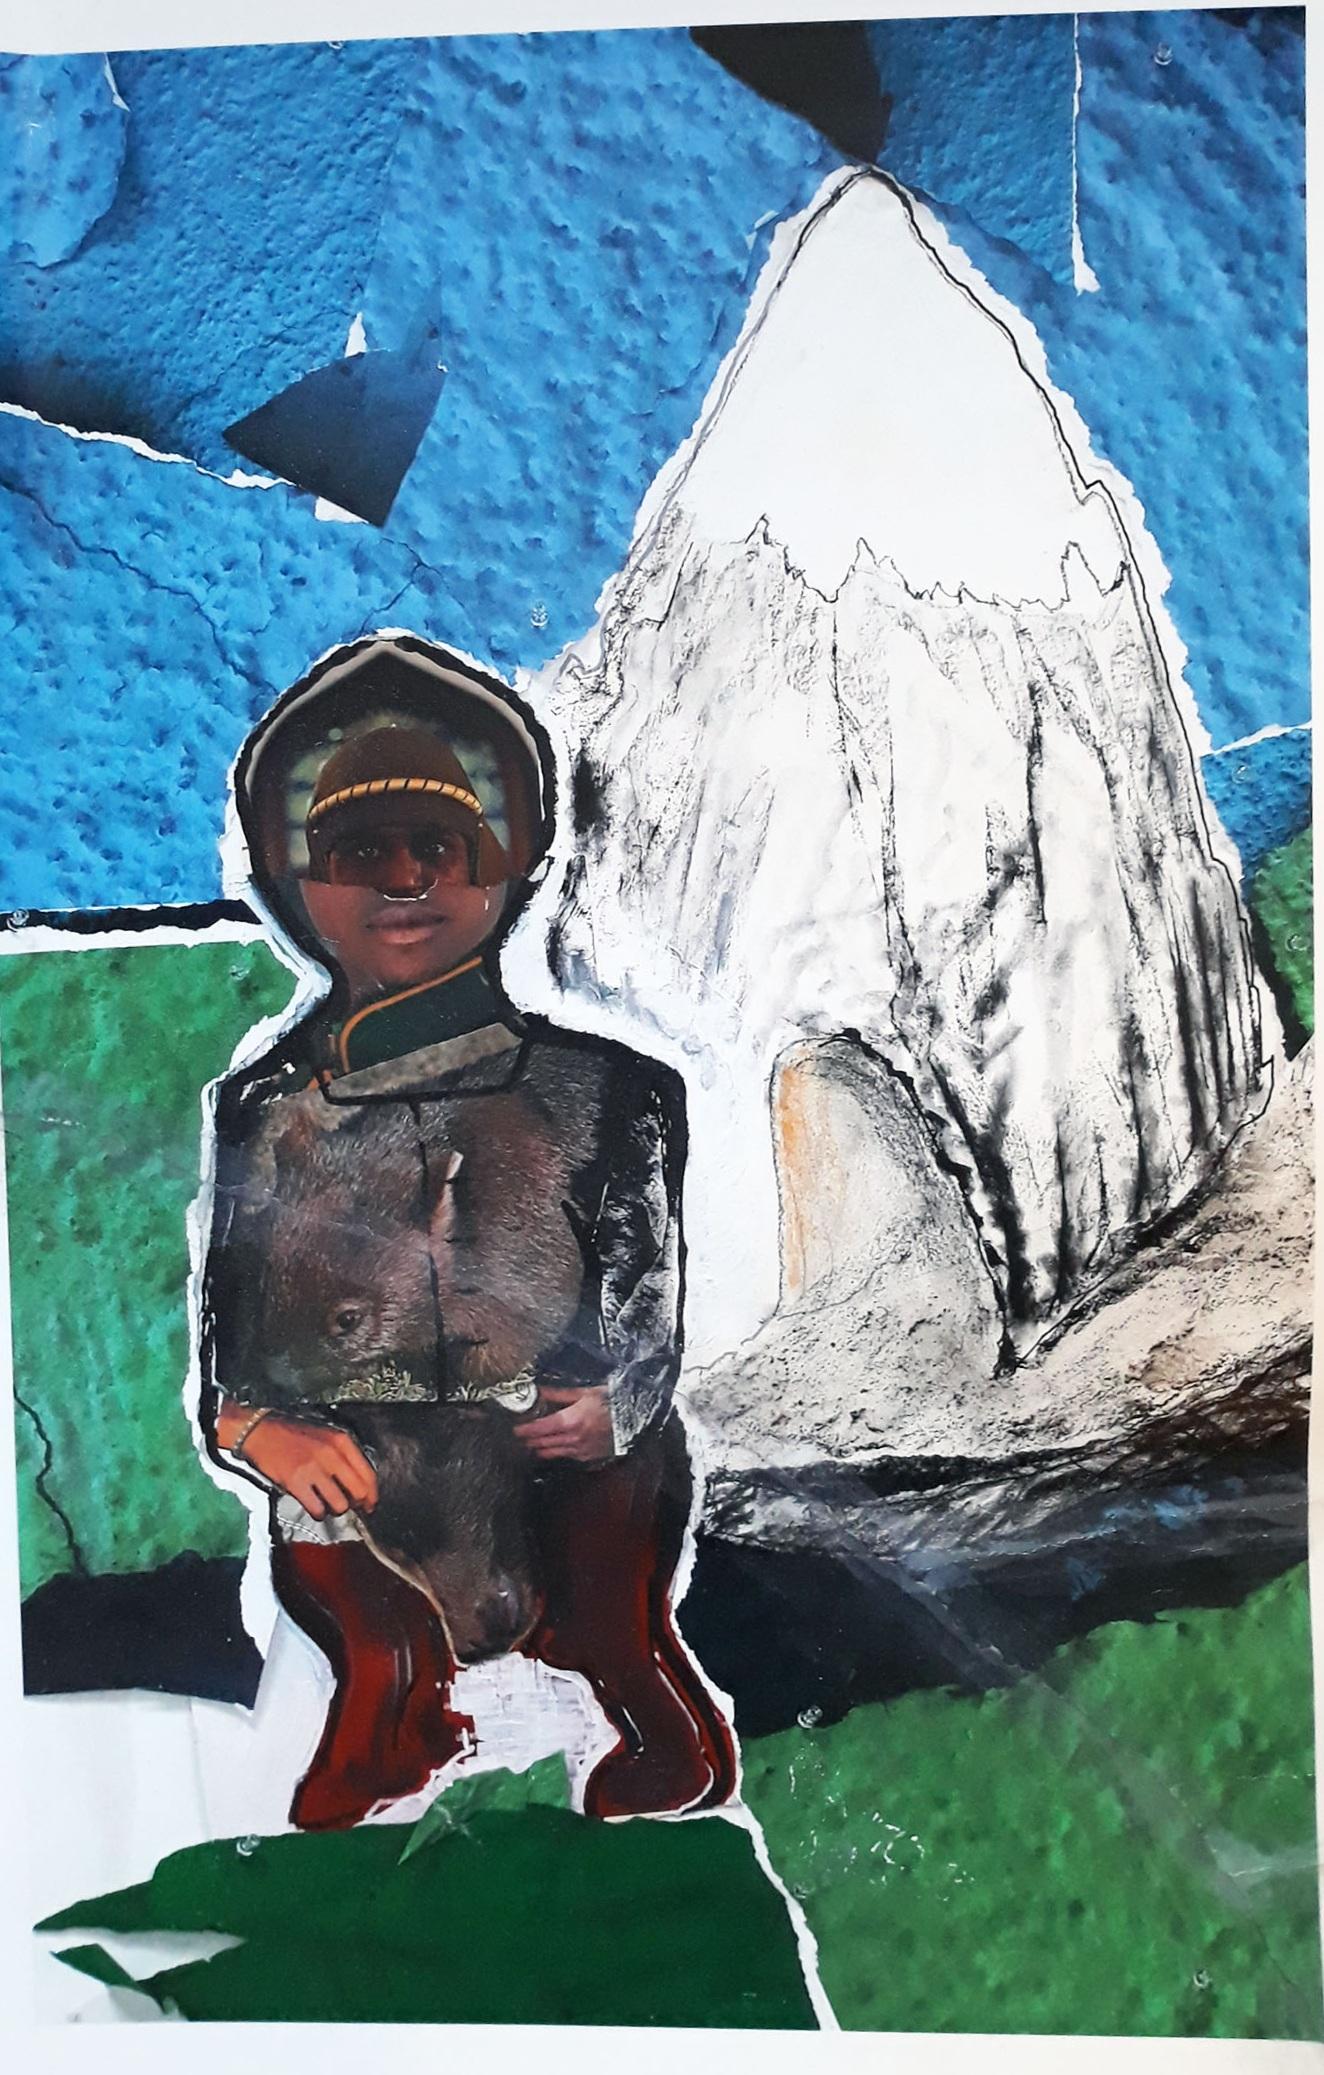 Volcano Boy 2015